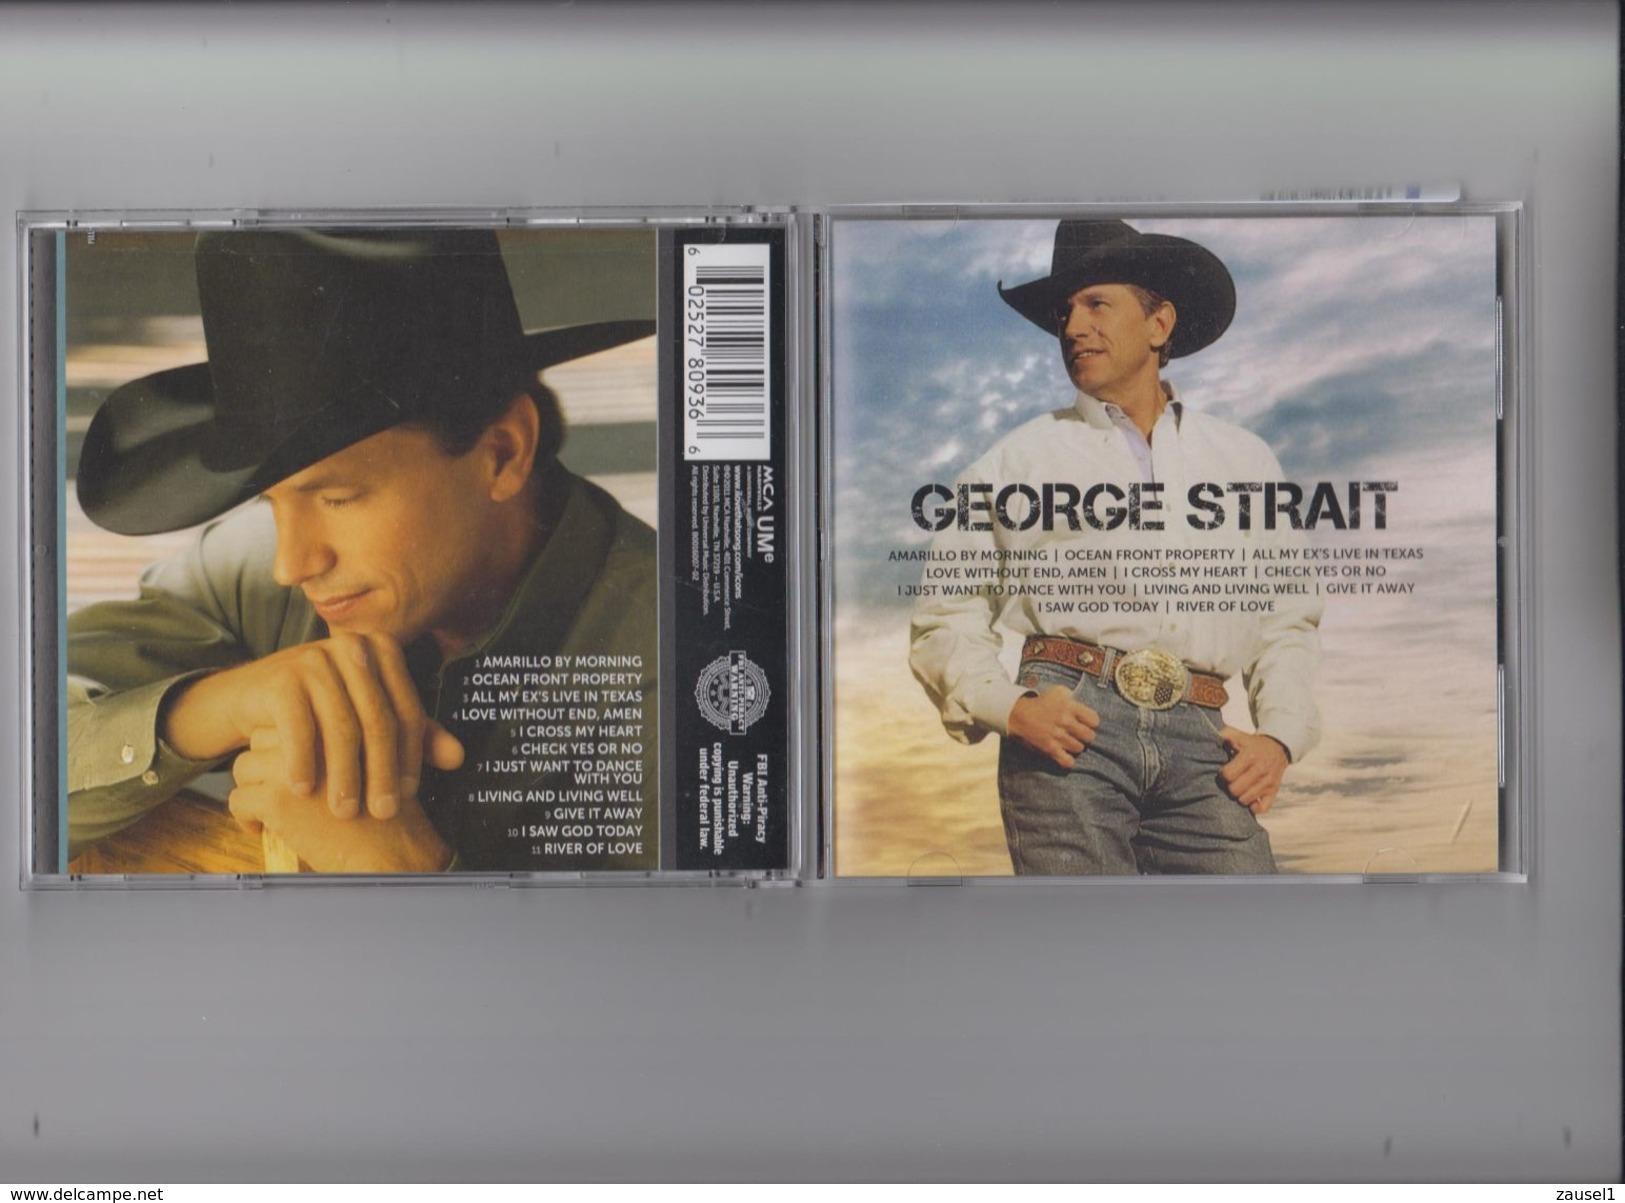 George Strait - ICON - Original CD - Country & Folk